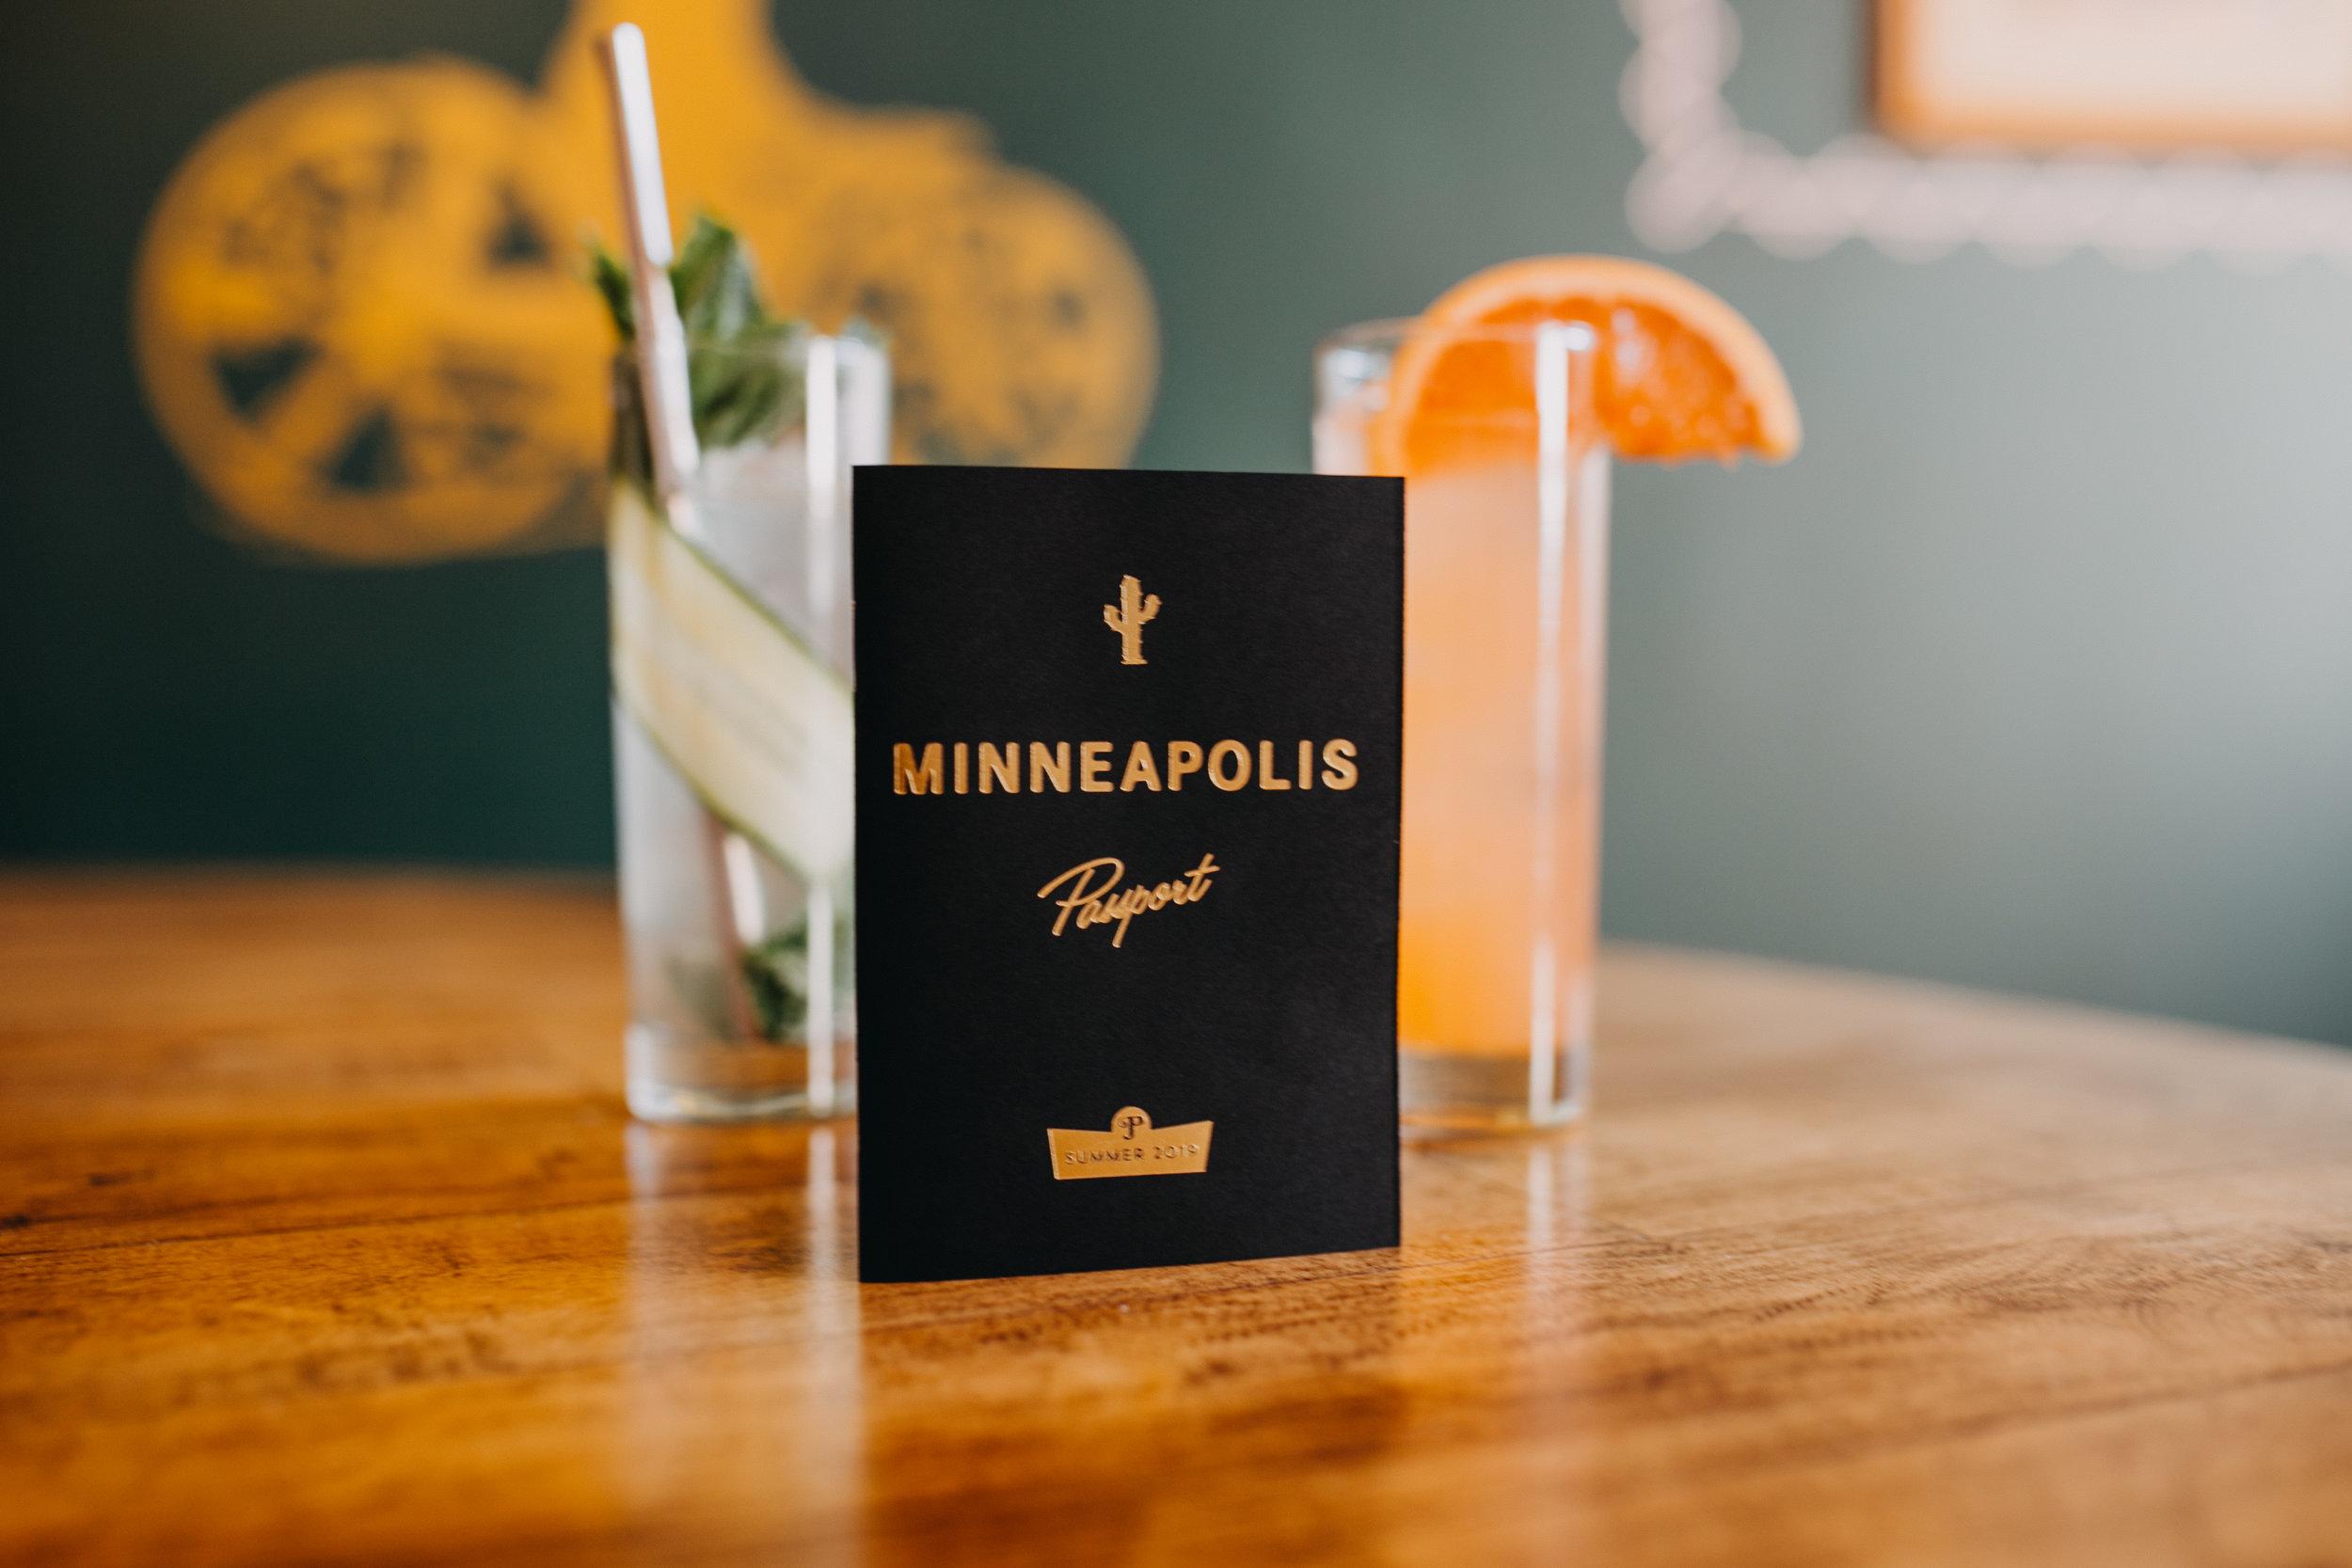 Minneapolis/St. Paul Patio Bars